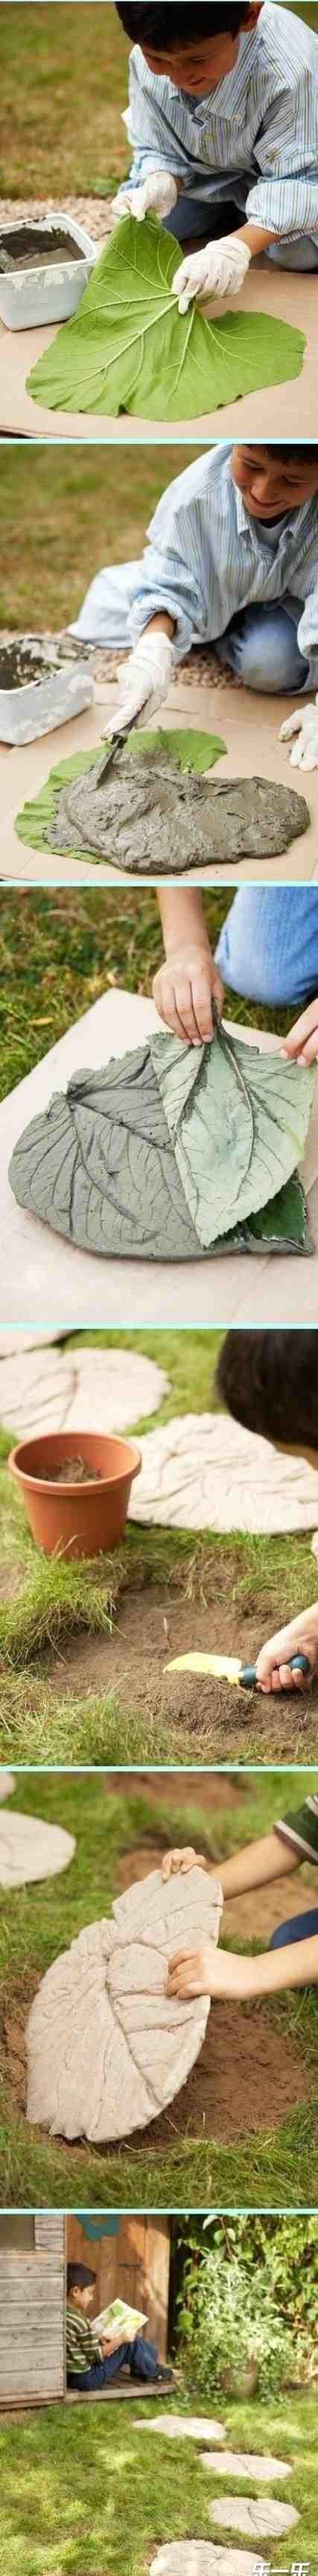 tremplins beton rhubarbe hosta feuille